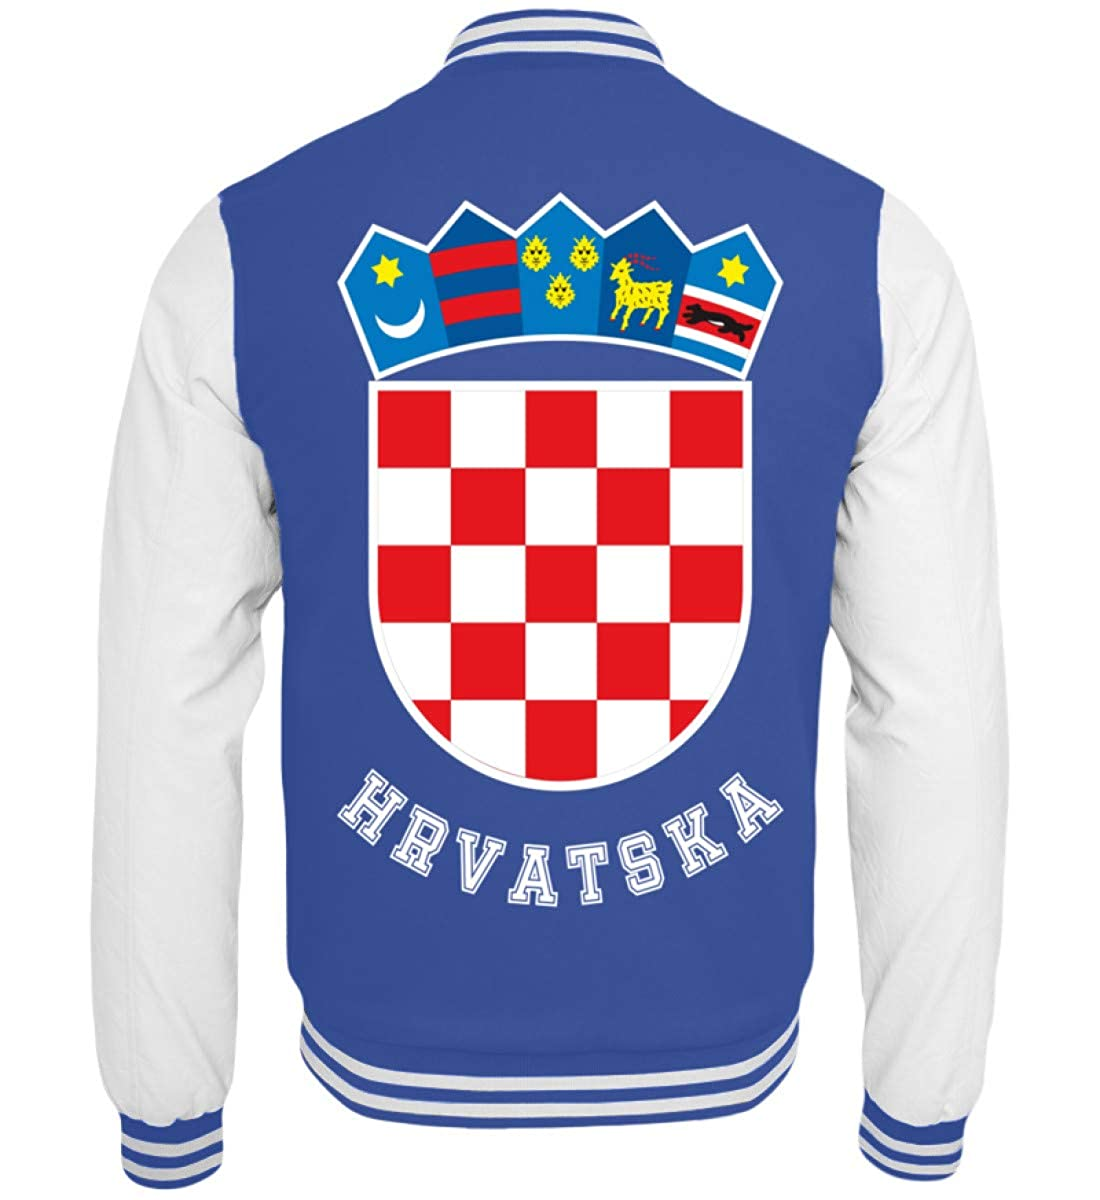 Hochwertige College Sweatjacke - Kroatisches Wappen Hrvatska T-Shirt Kroatien Trikot Geschenk Generic A19K1YUO_JH043*B*__XS__6751